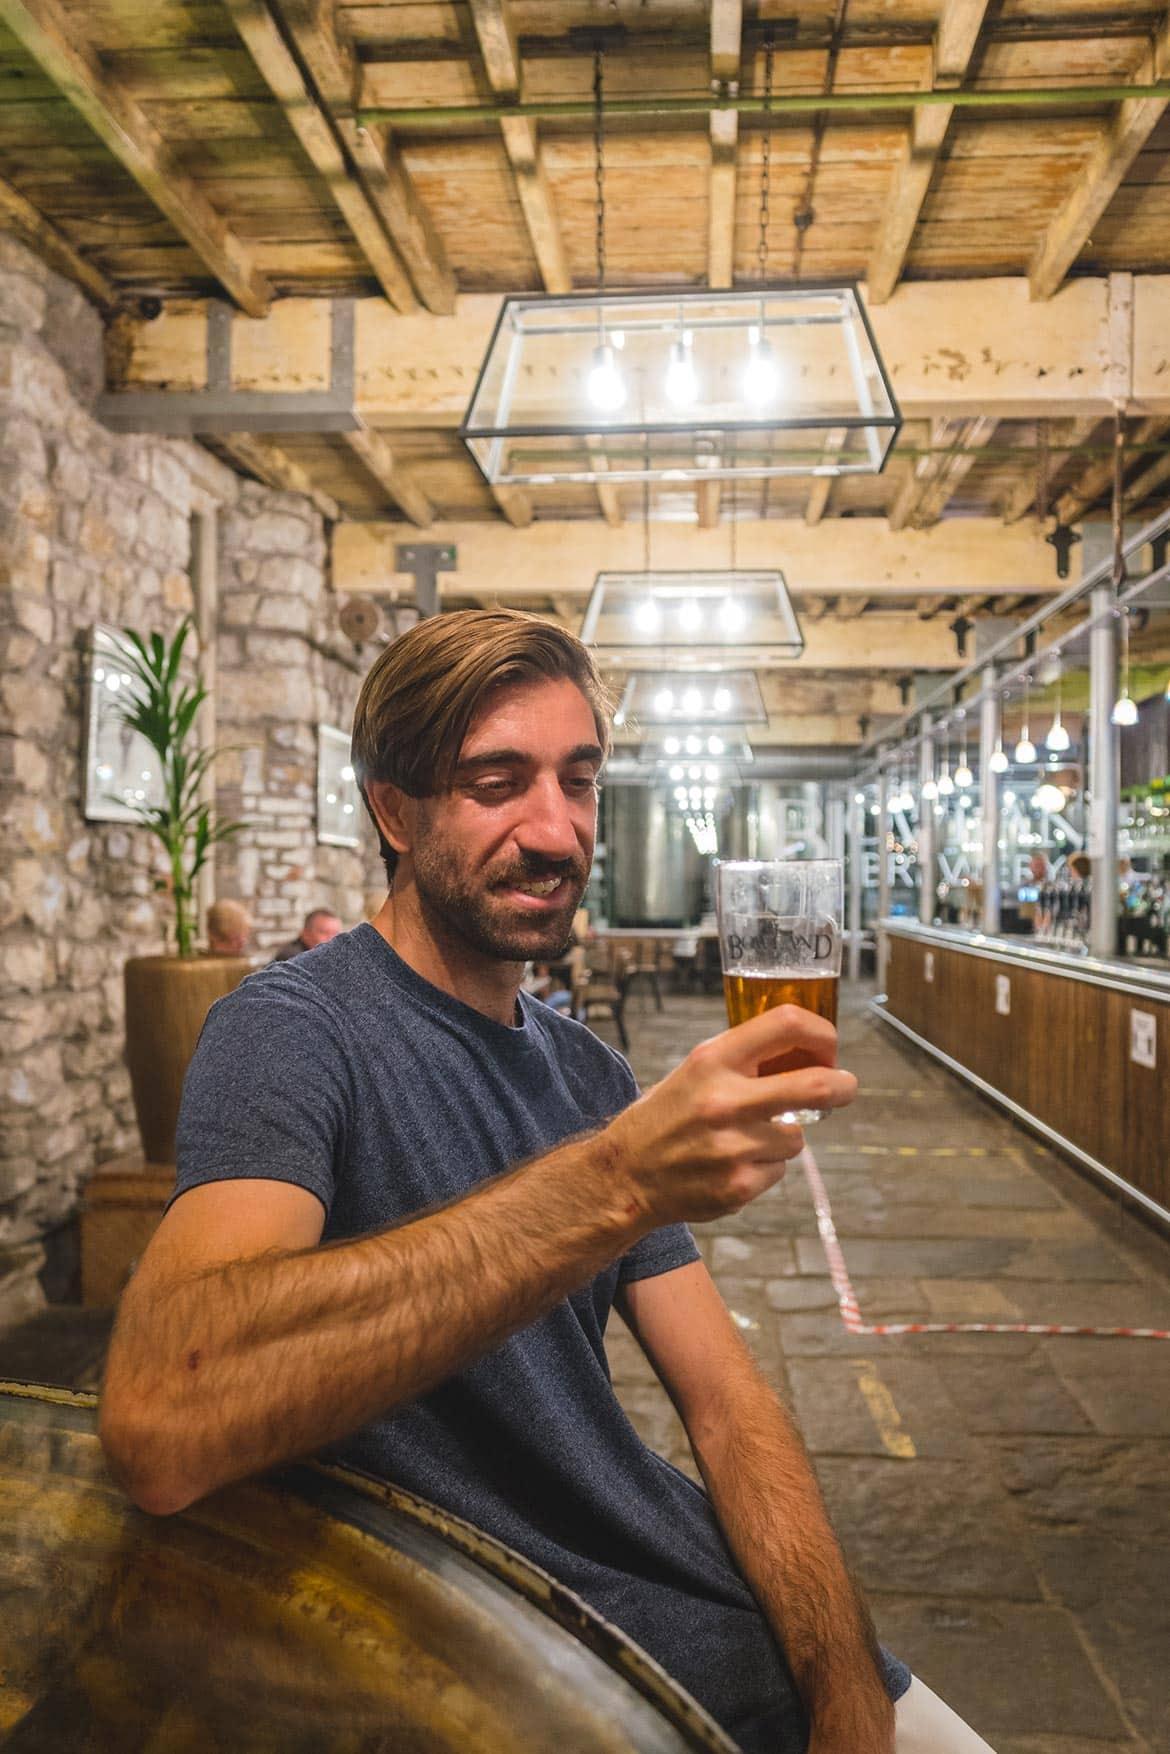 clitheroe beer hall